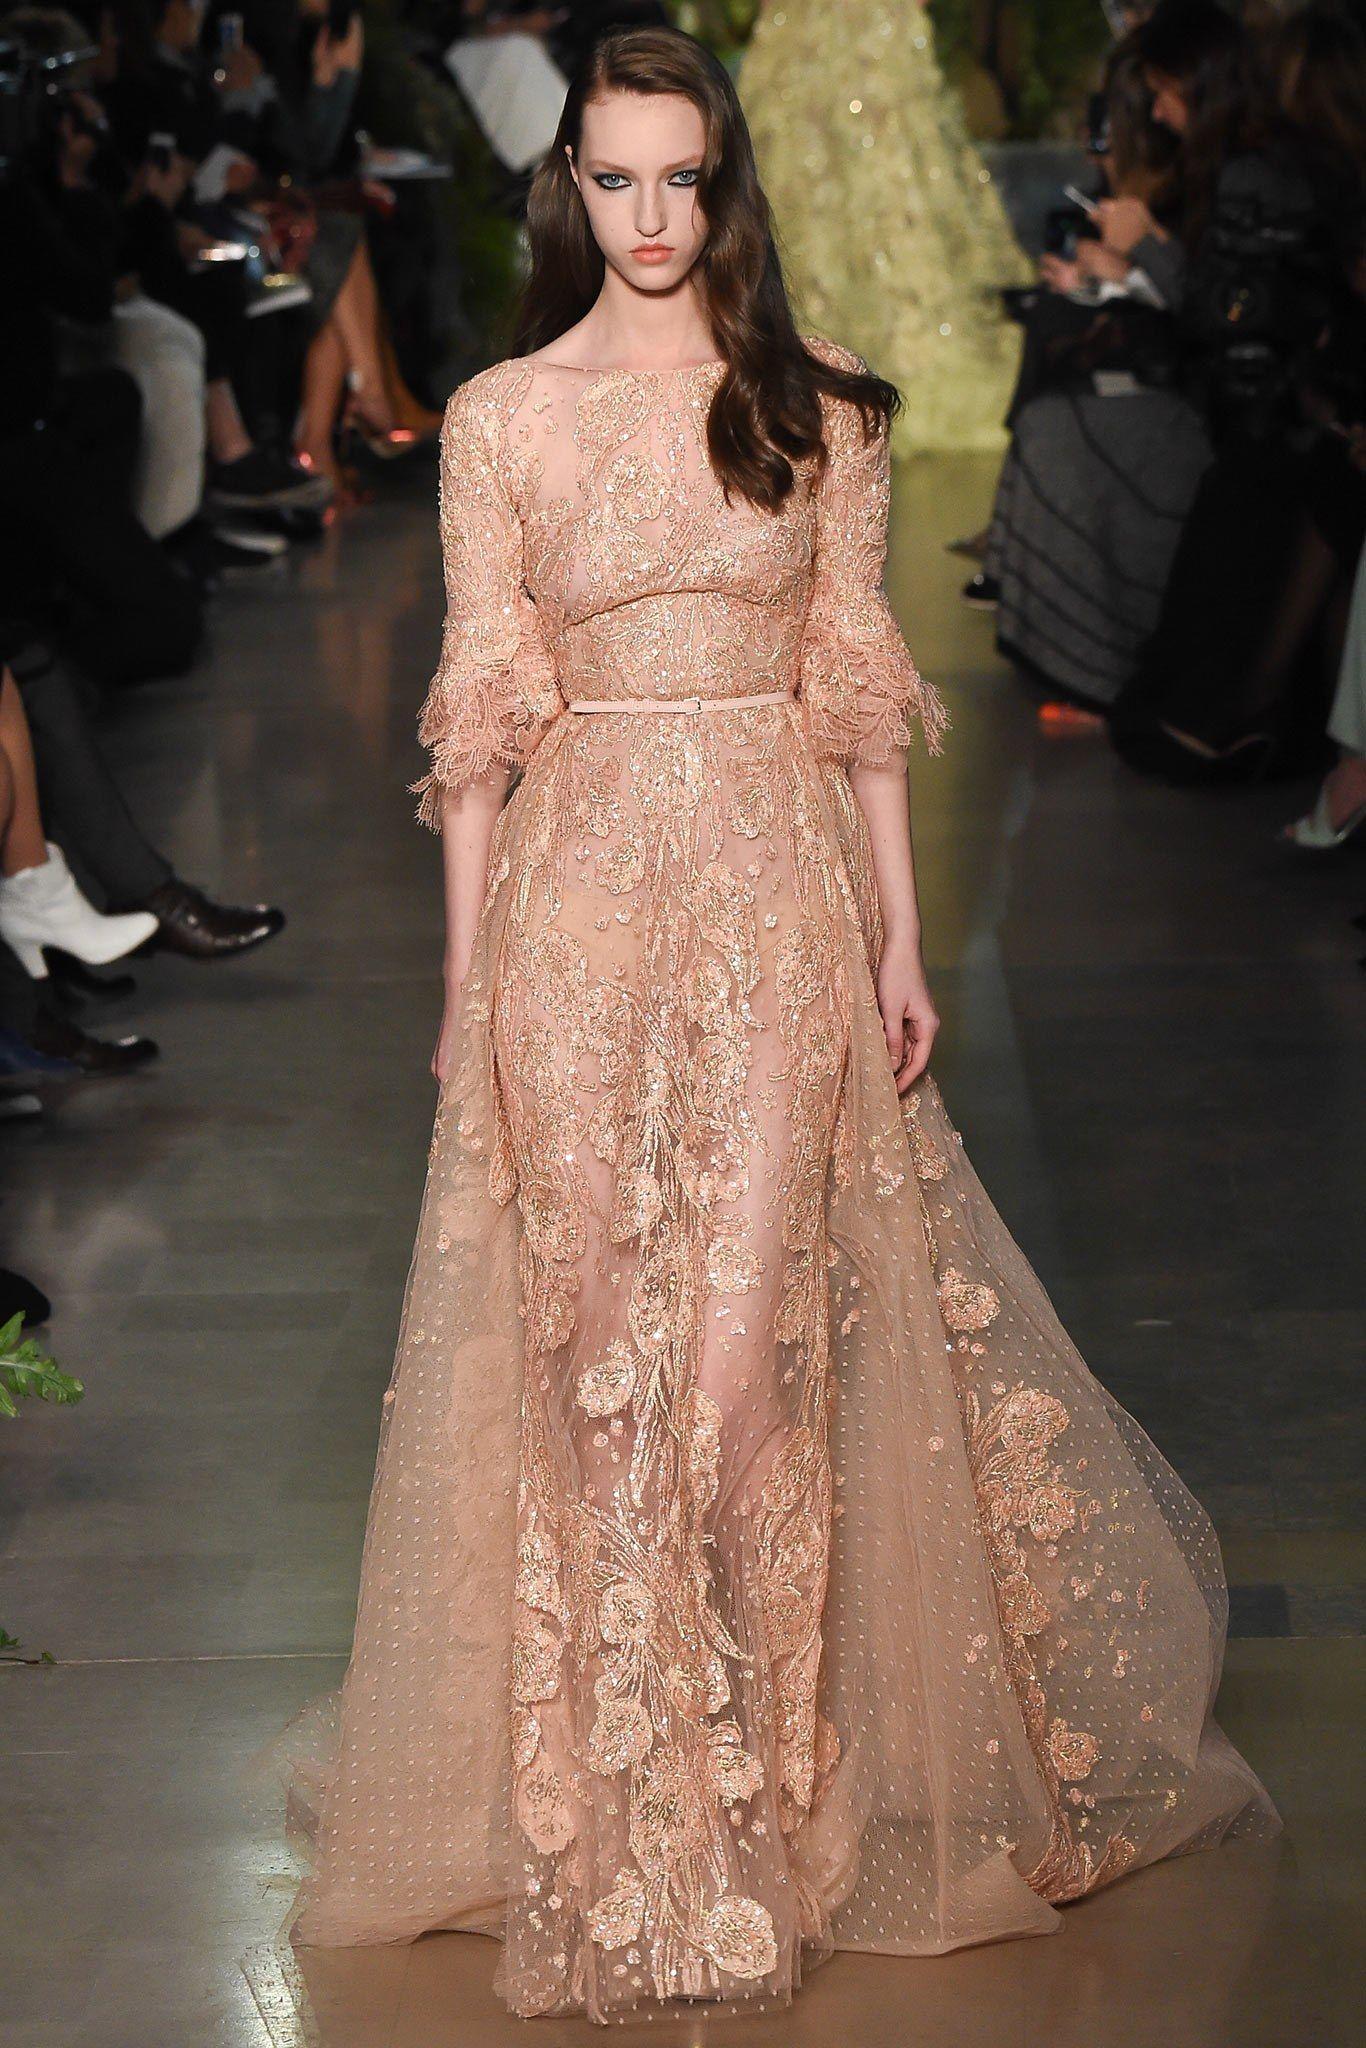 Elie saab spring couture fashion show elie saab spring